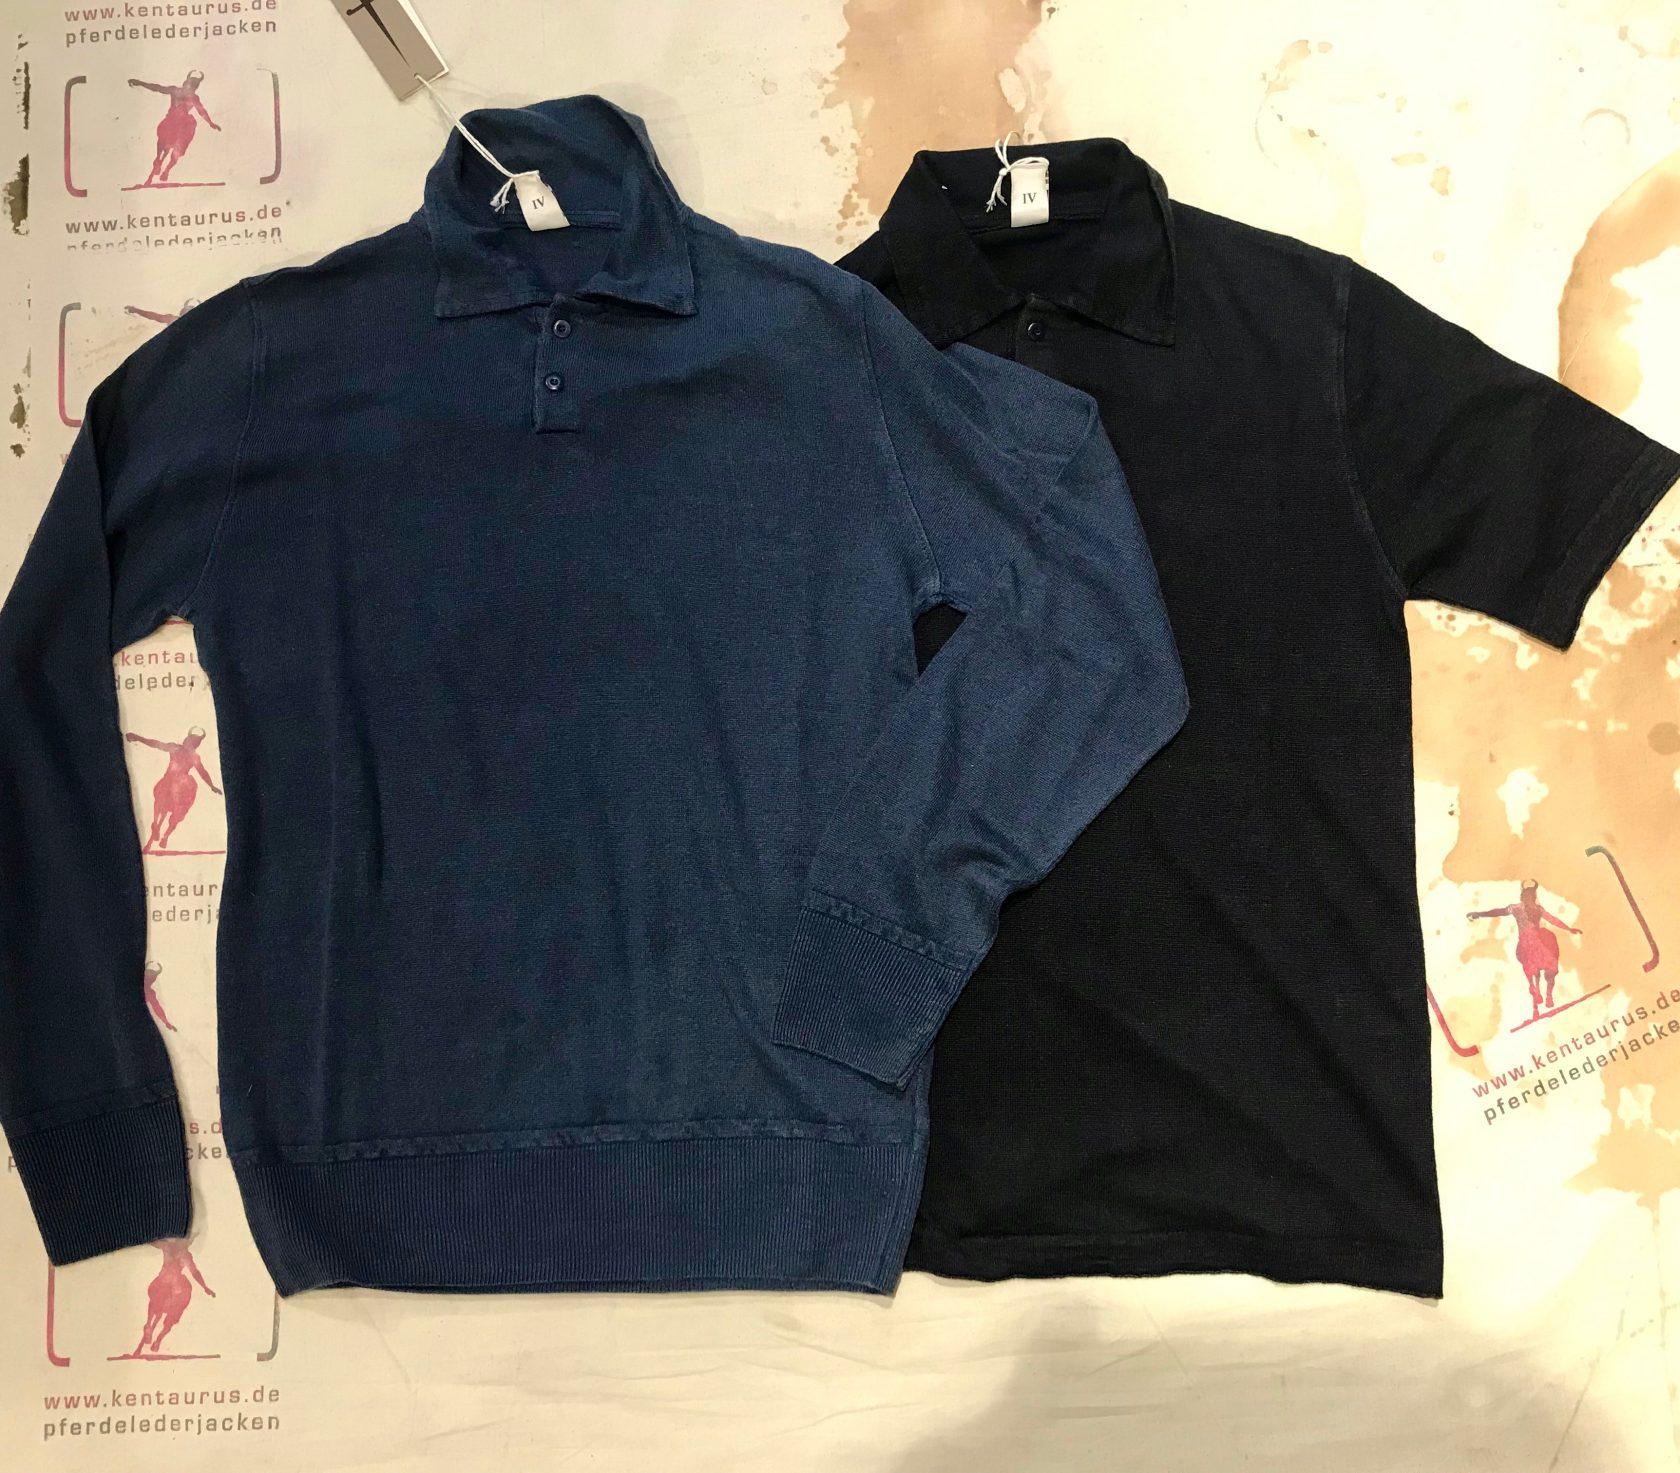 G.R.P. polo linen shirts blue and dark blue